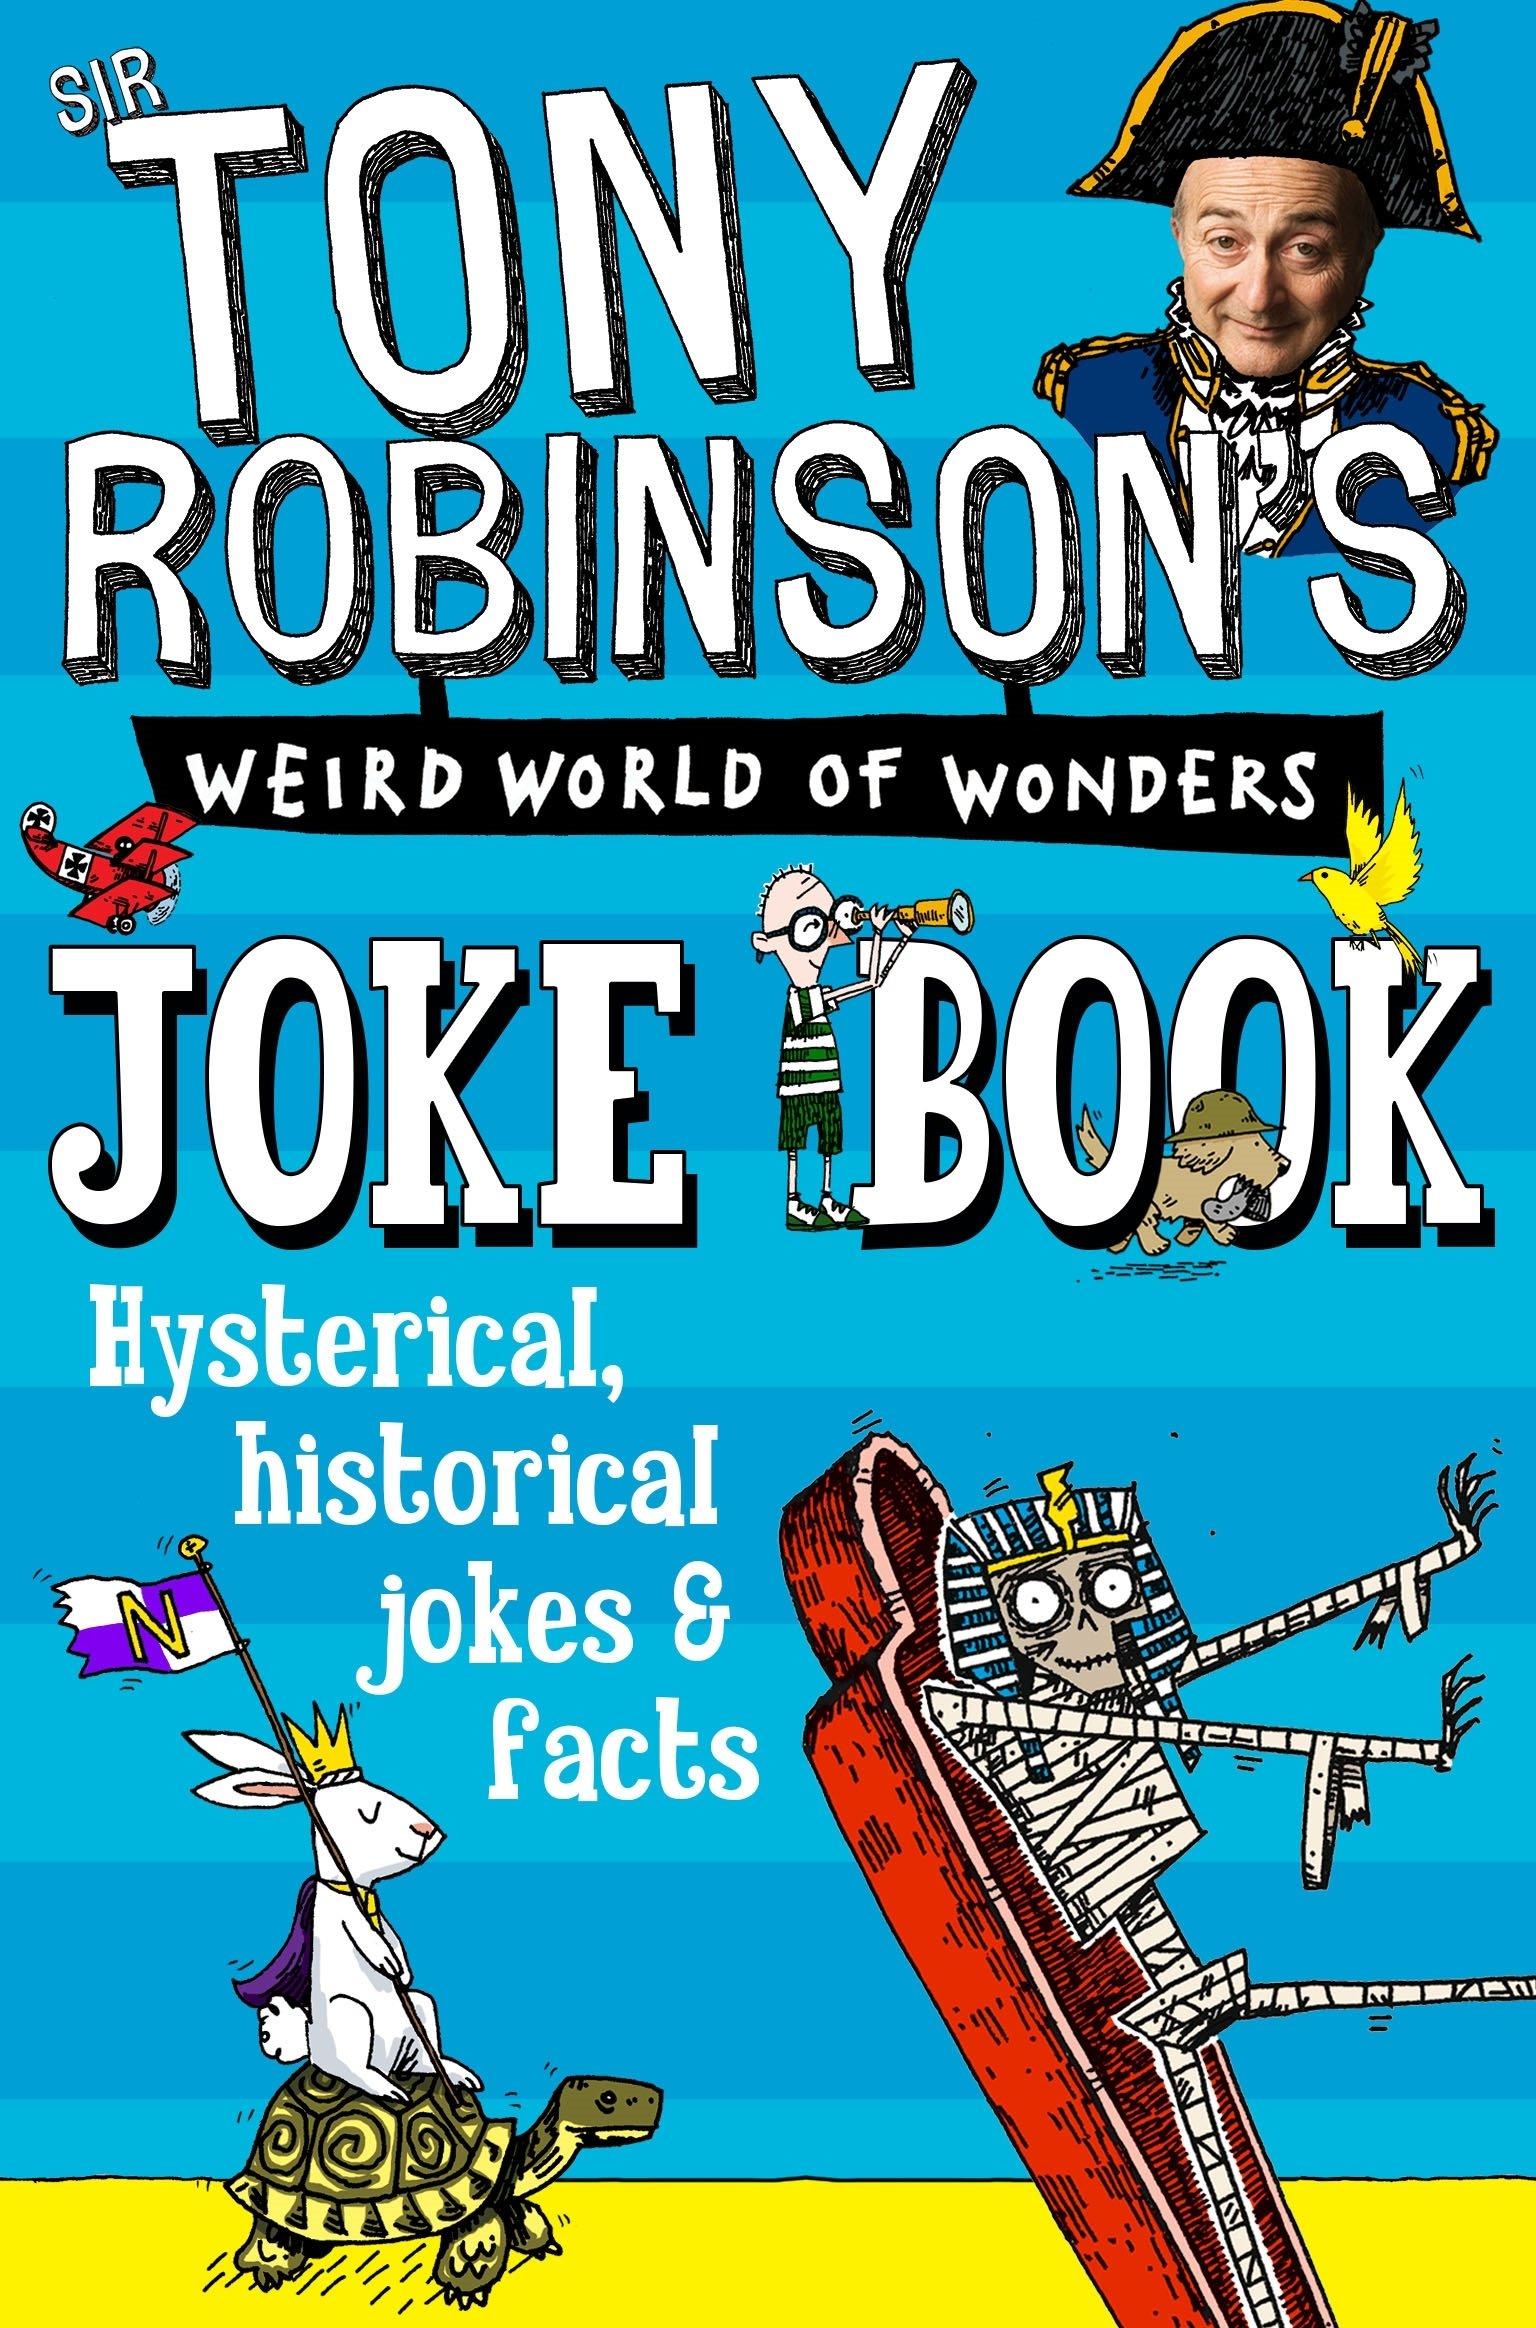 Tony Robinson's Weird World of Wonders Joke Book